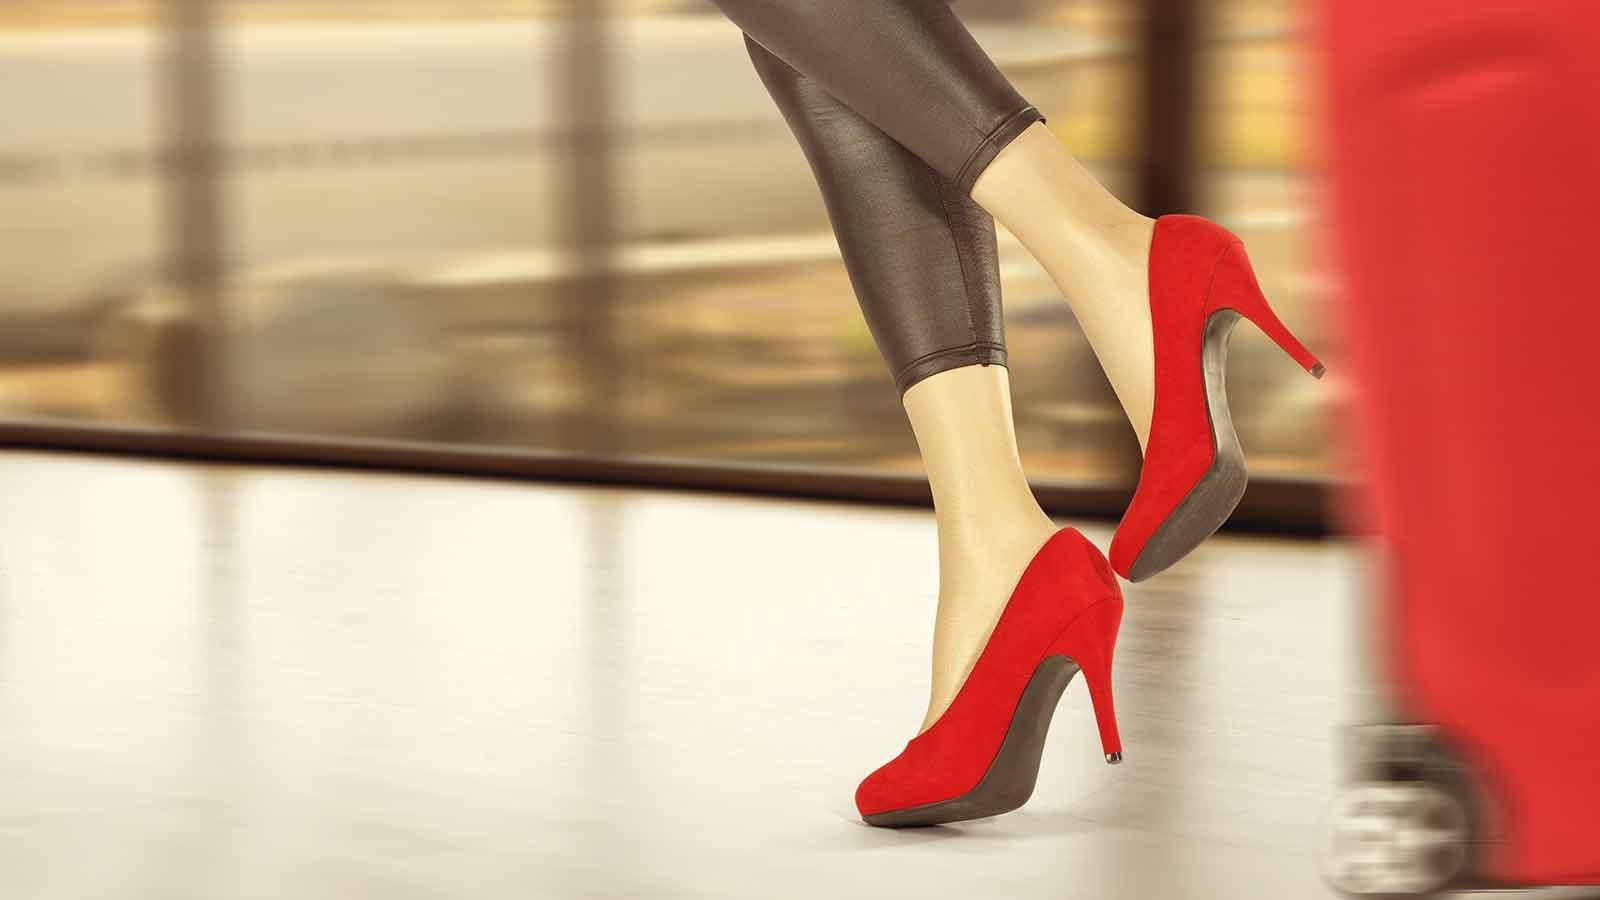 woman running down an airport walkway in heels